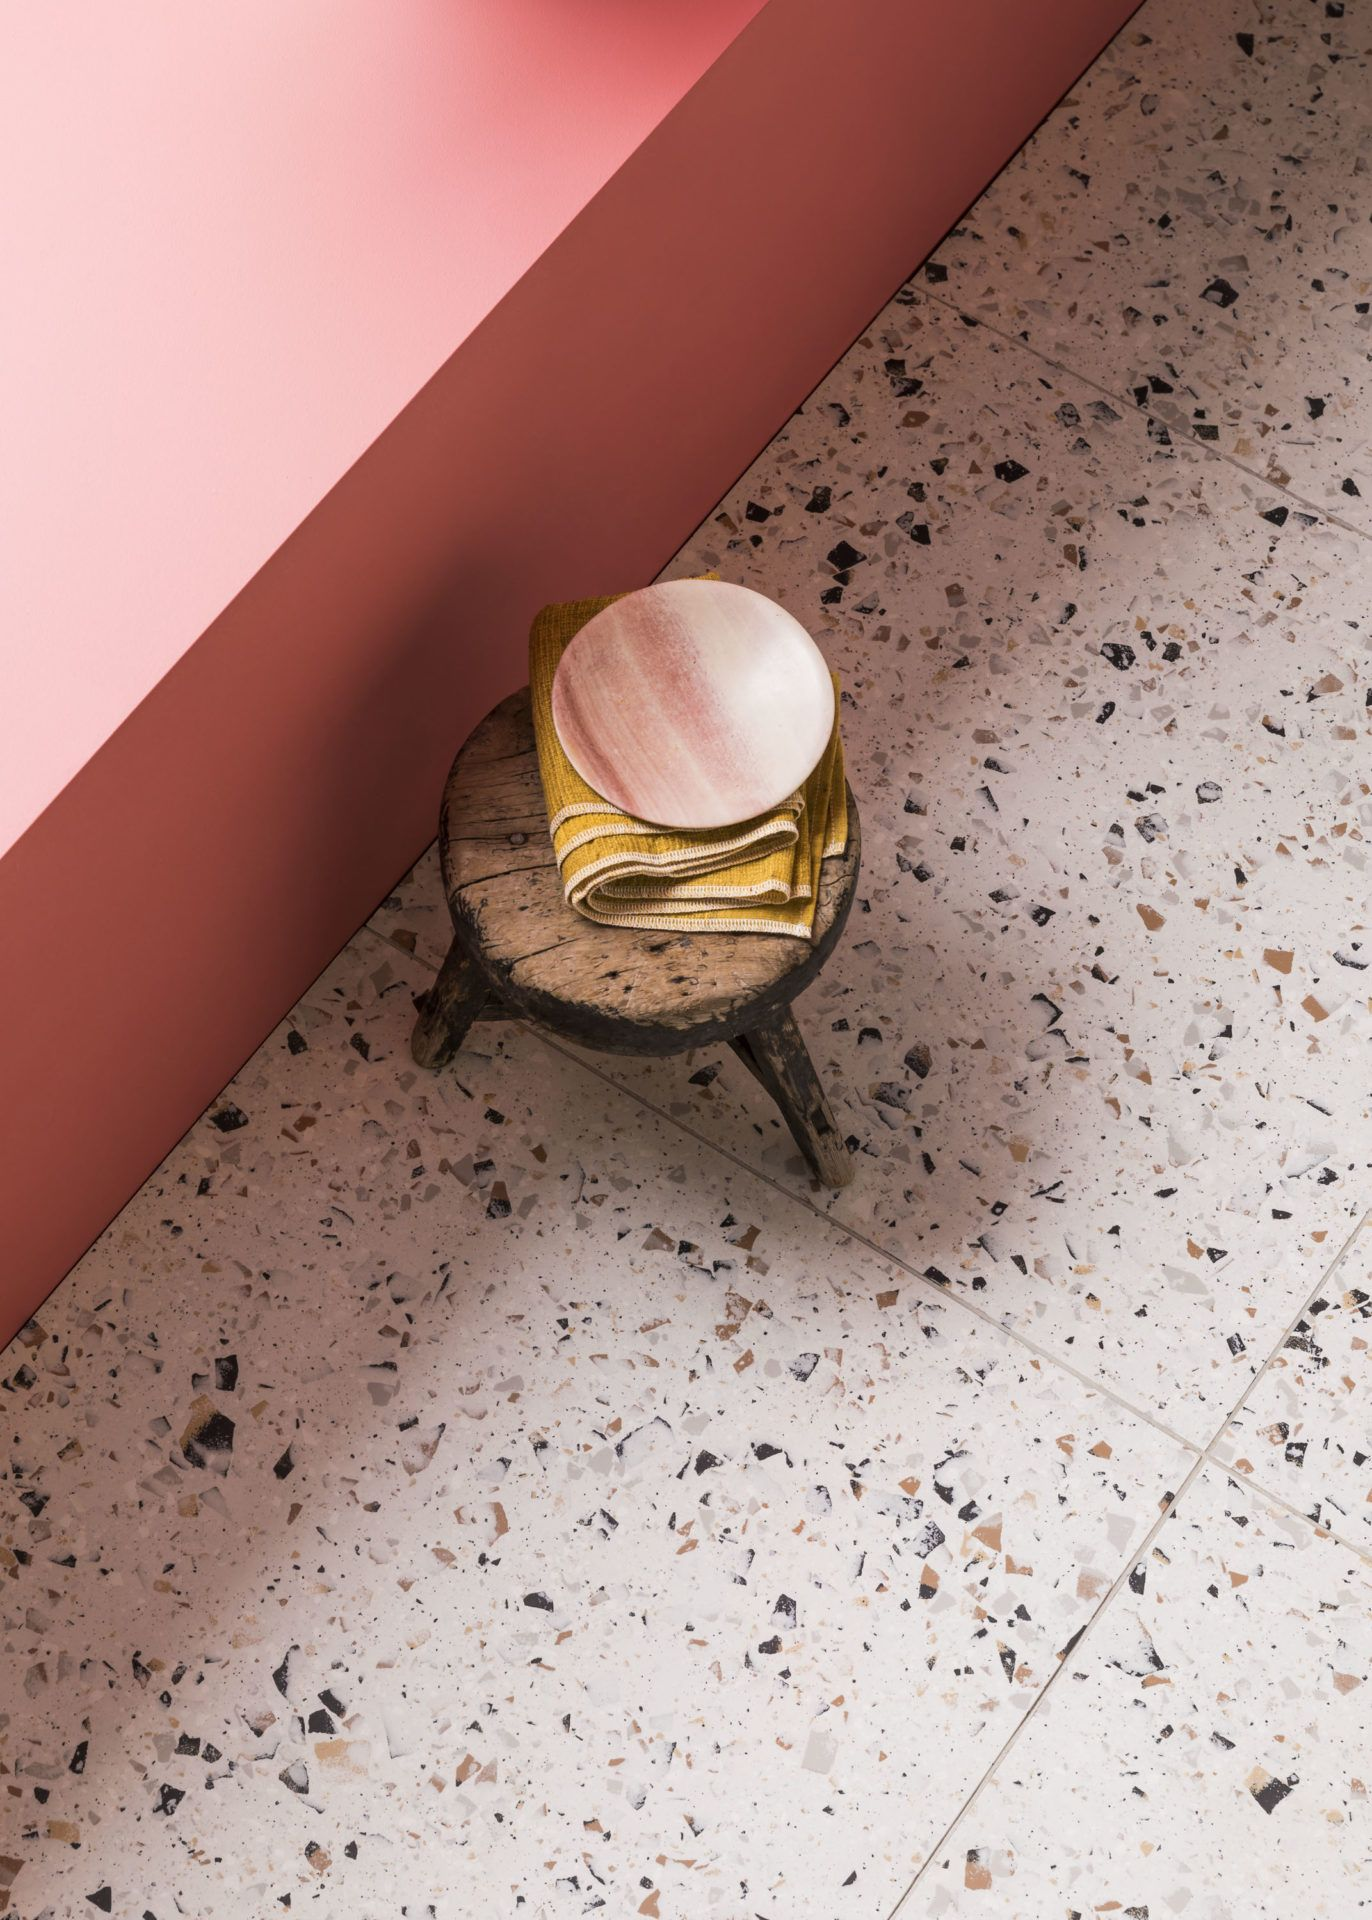 Commit a floor strip porcelain final, sorry